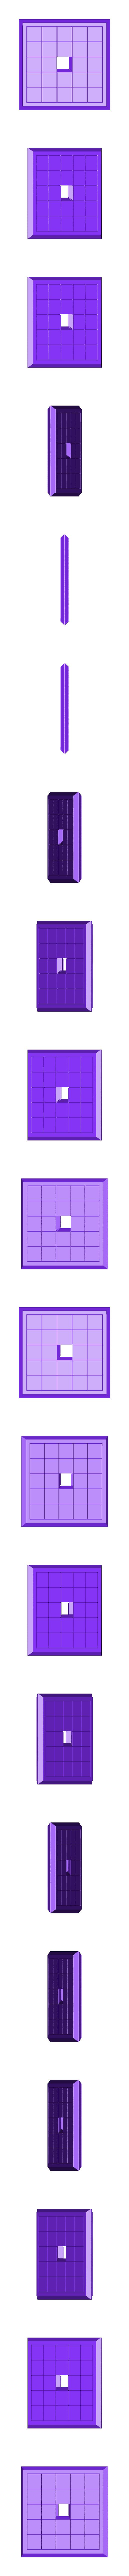 Sliding5x5BlankPuzzle4.stl Download STL file Two Sided Sliding Puzzle • 3D printable model, Jinja